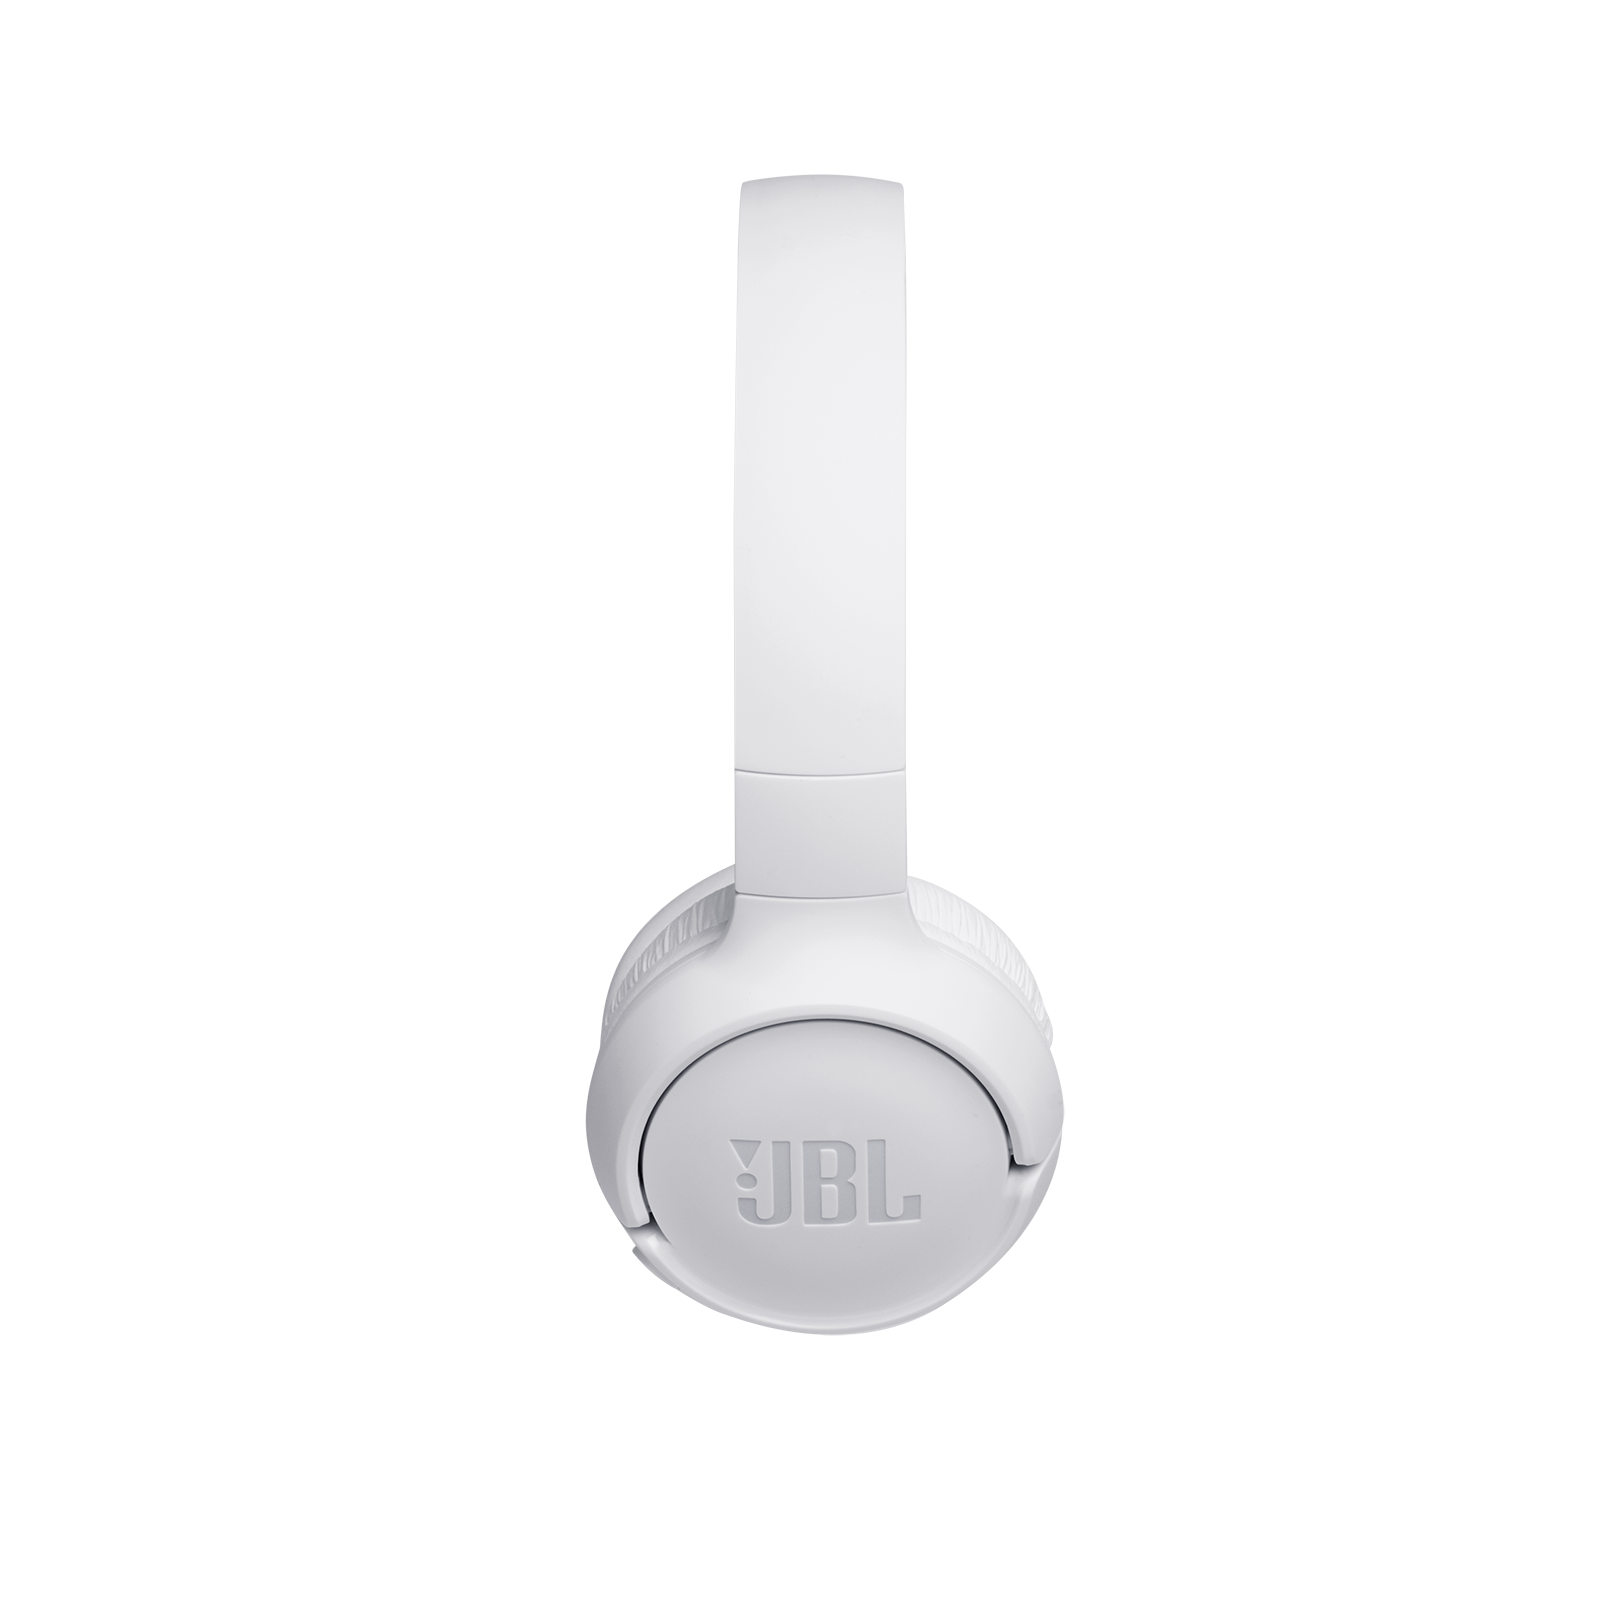 JBL TUNE 500BT - White - Wireless on-ear headphones - Left